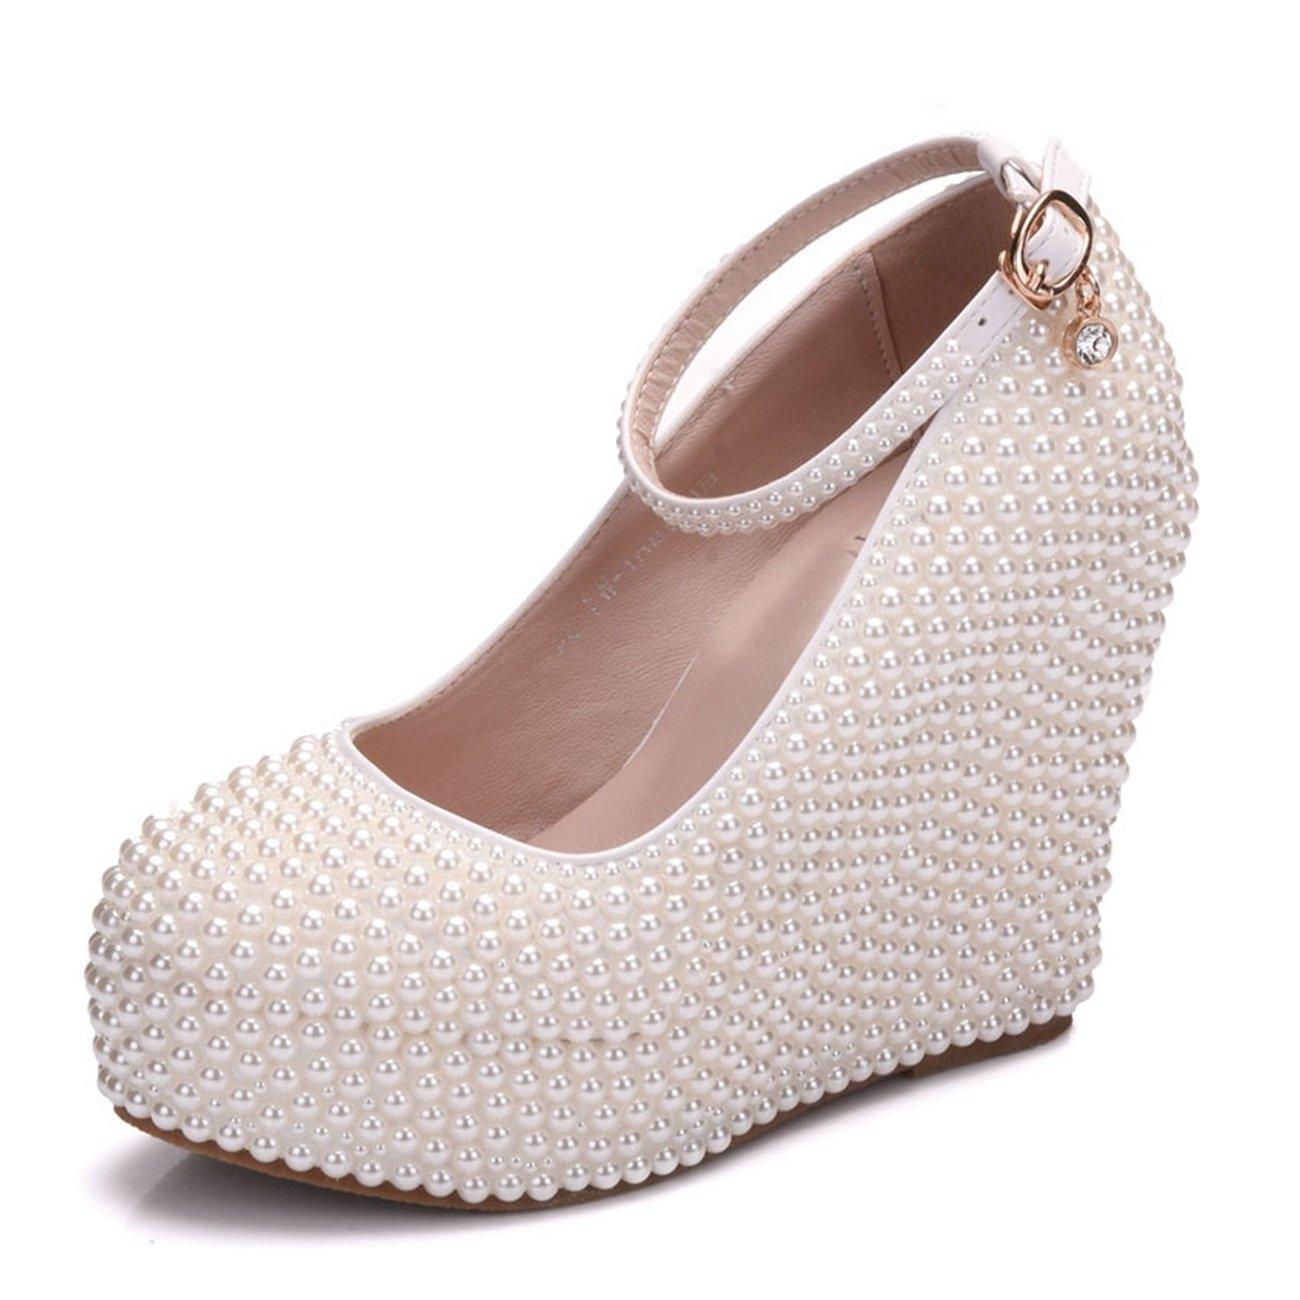 Minishion Womens Hidden High Platform Pearl Beading Wedge Heel Wedding Evening Shoes B07556LPHS 8.5 B(M) US|Ivory-10cm Heel